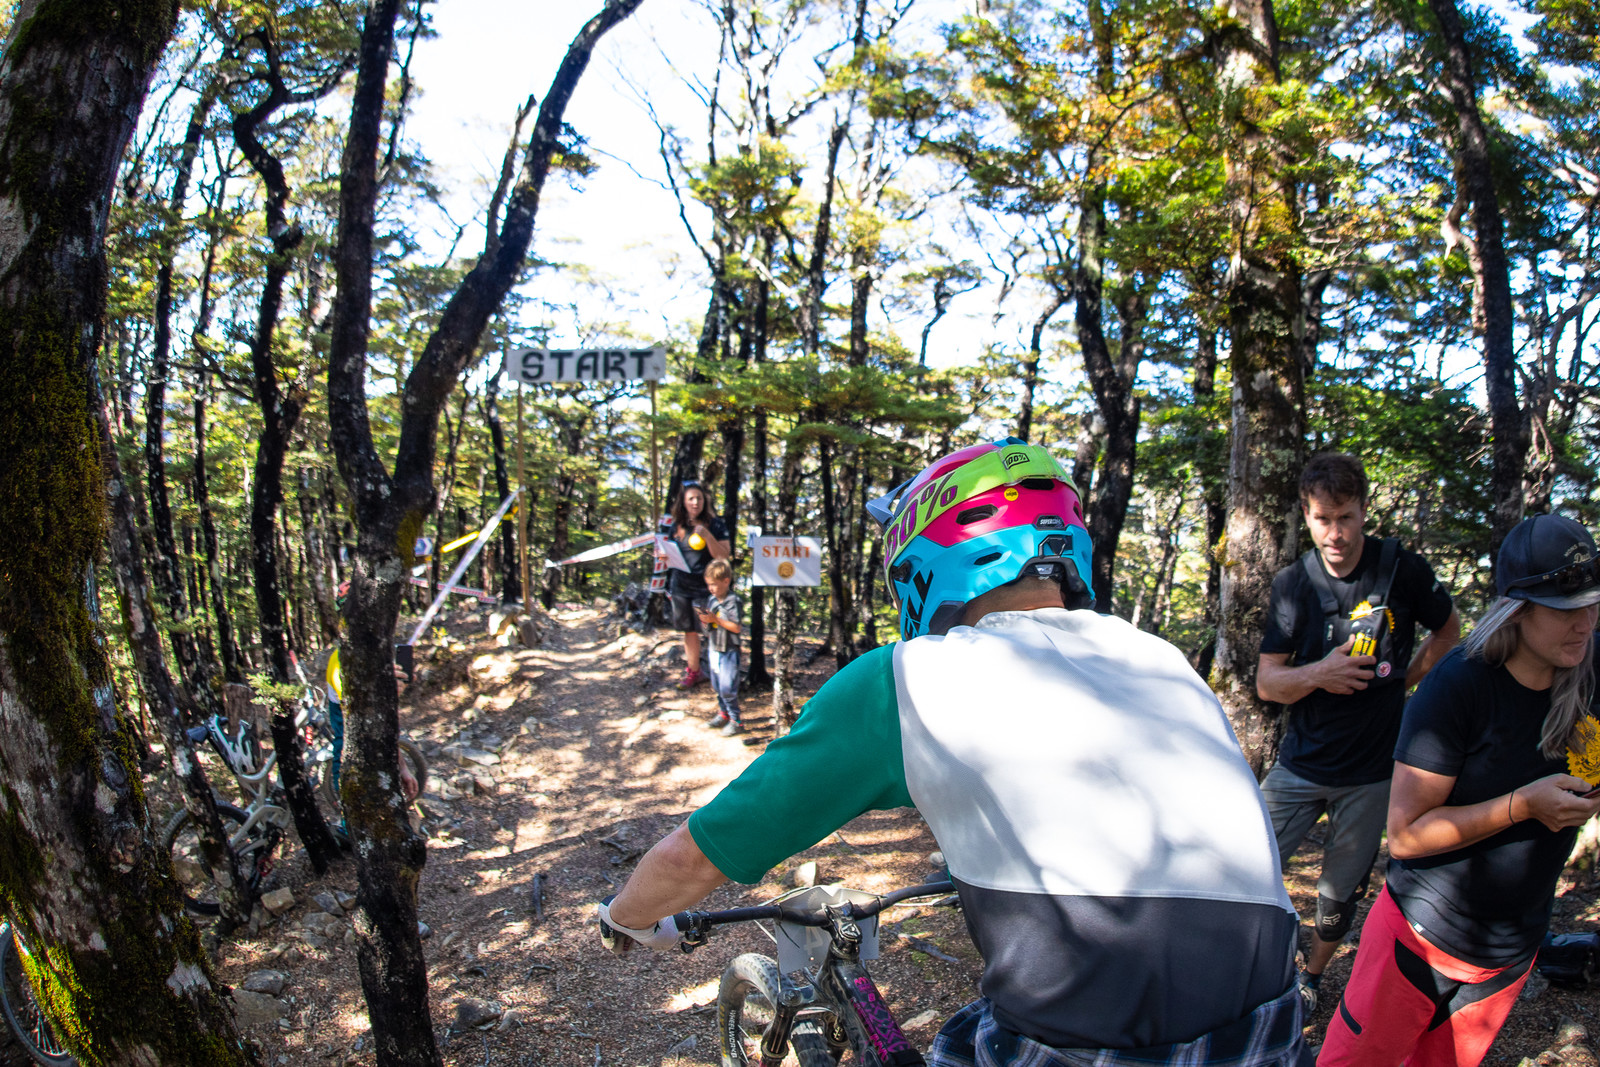 Natural Selection - 2019 Dodzy Memorial Enduro - Mountain Biking Pictures - Vital MTB